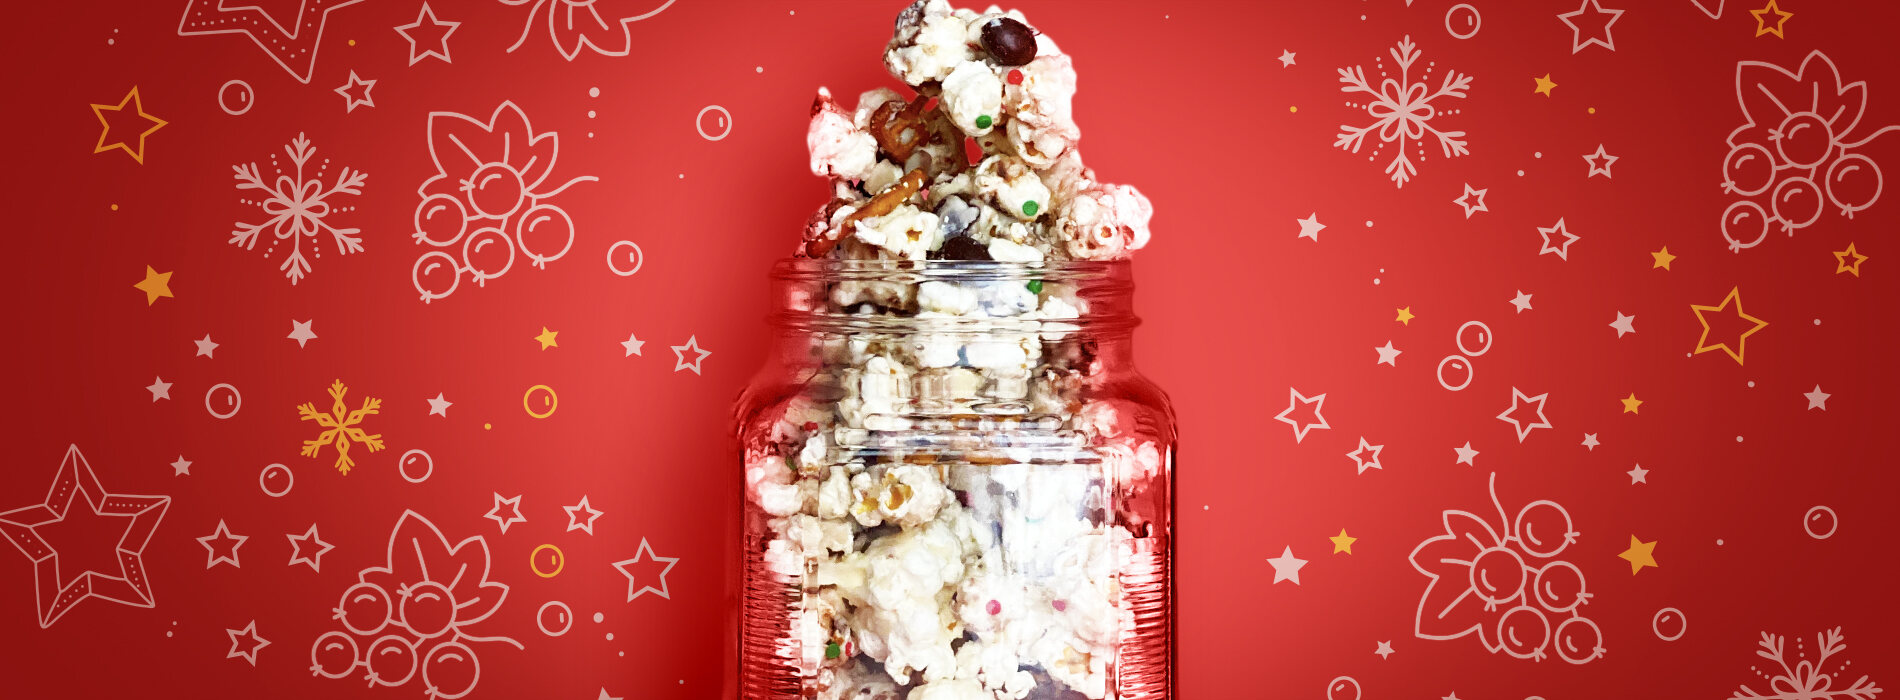 SUN-0168_HolidayRecipeImages_Reindeer_Popcorn